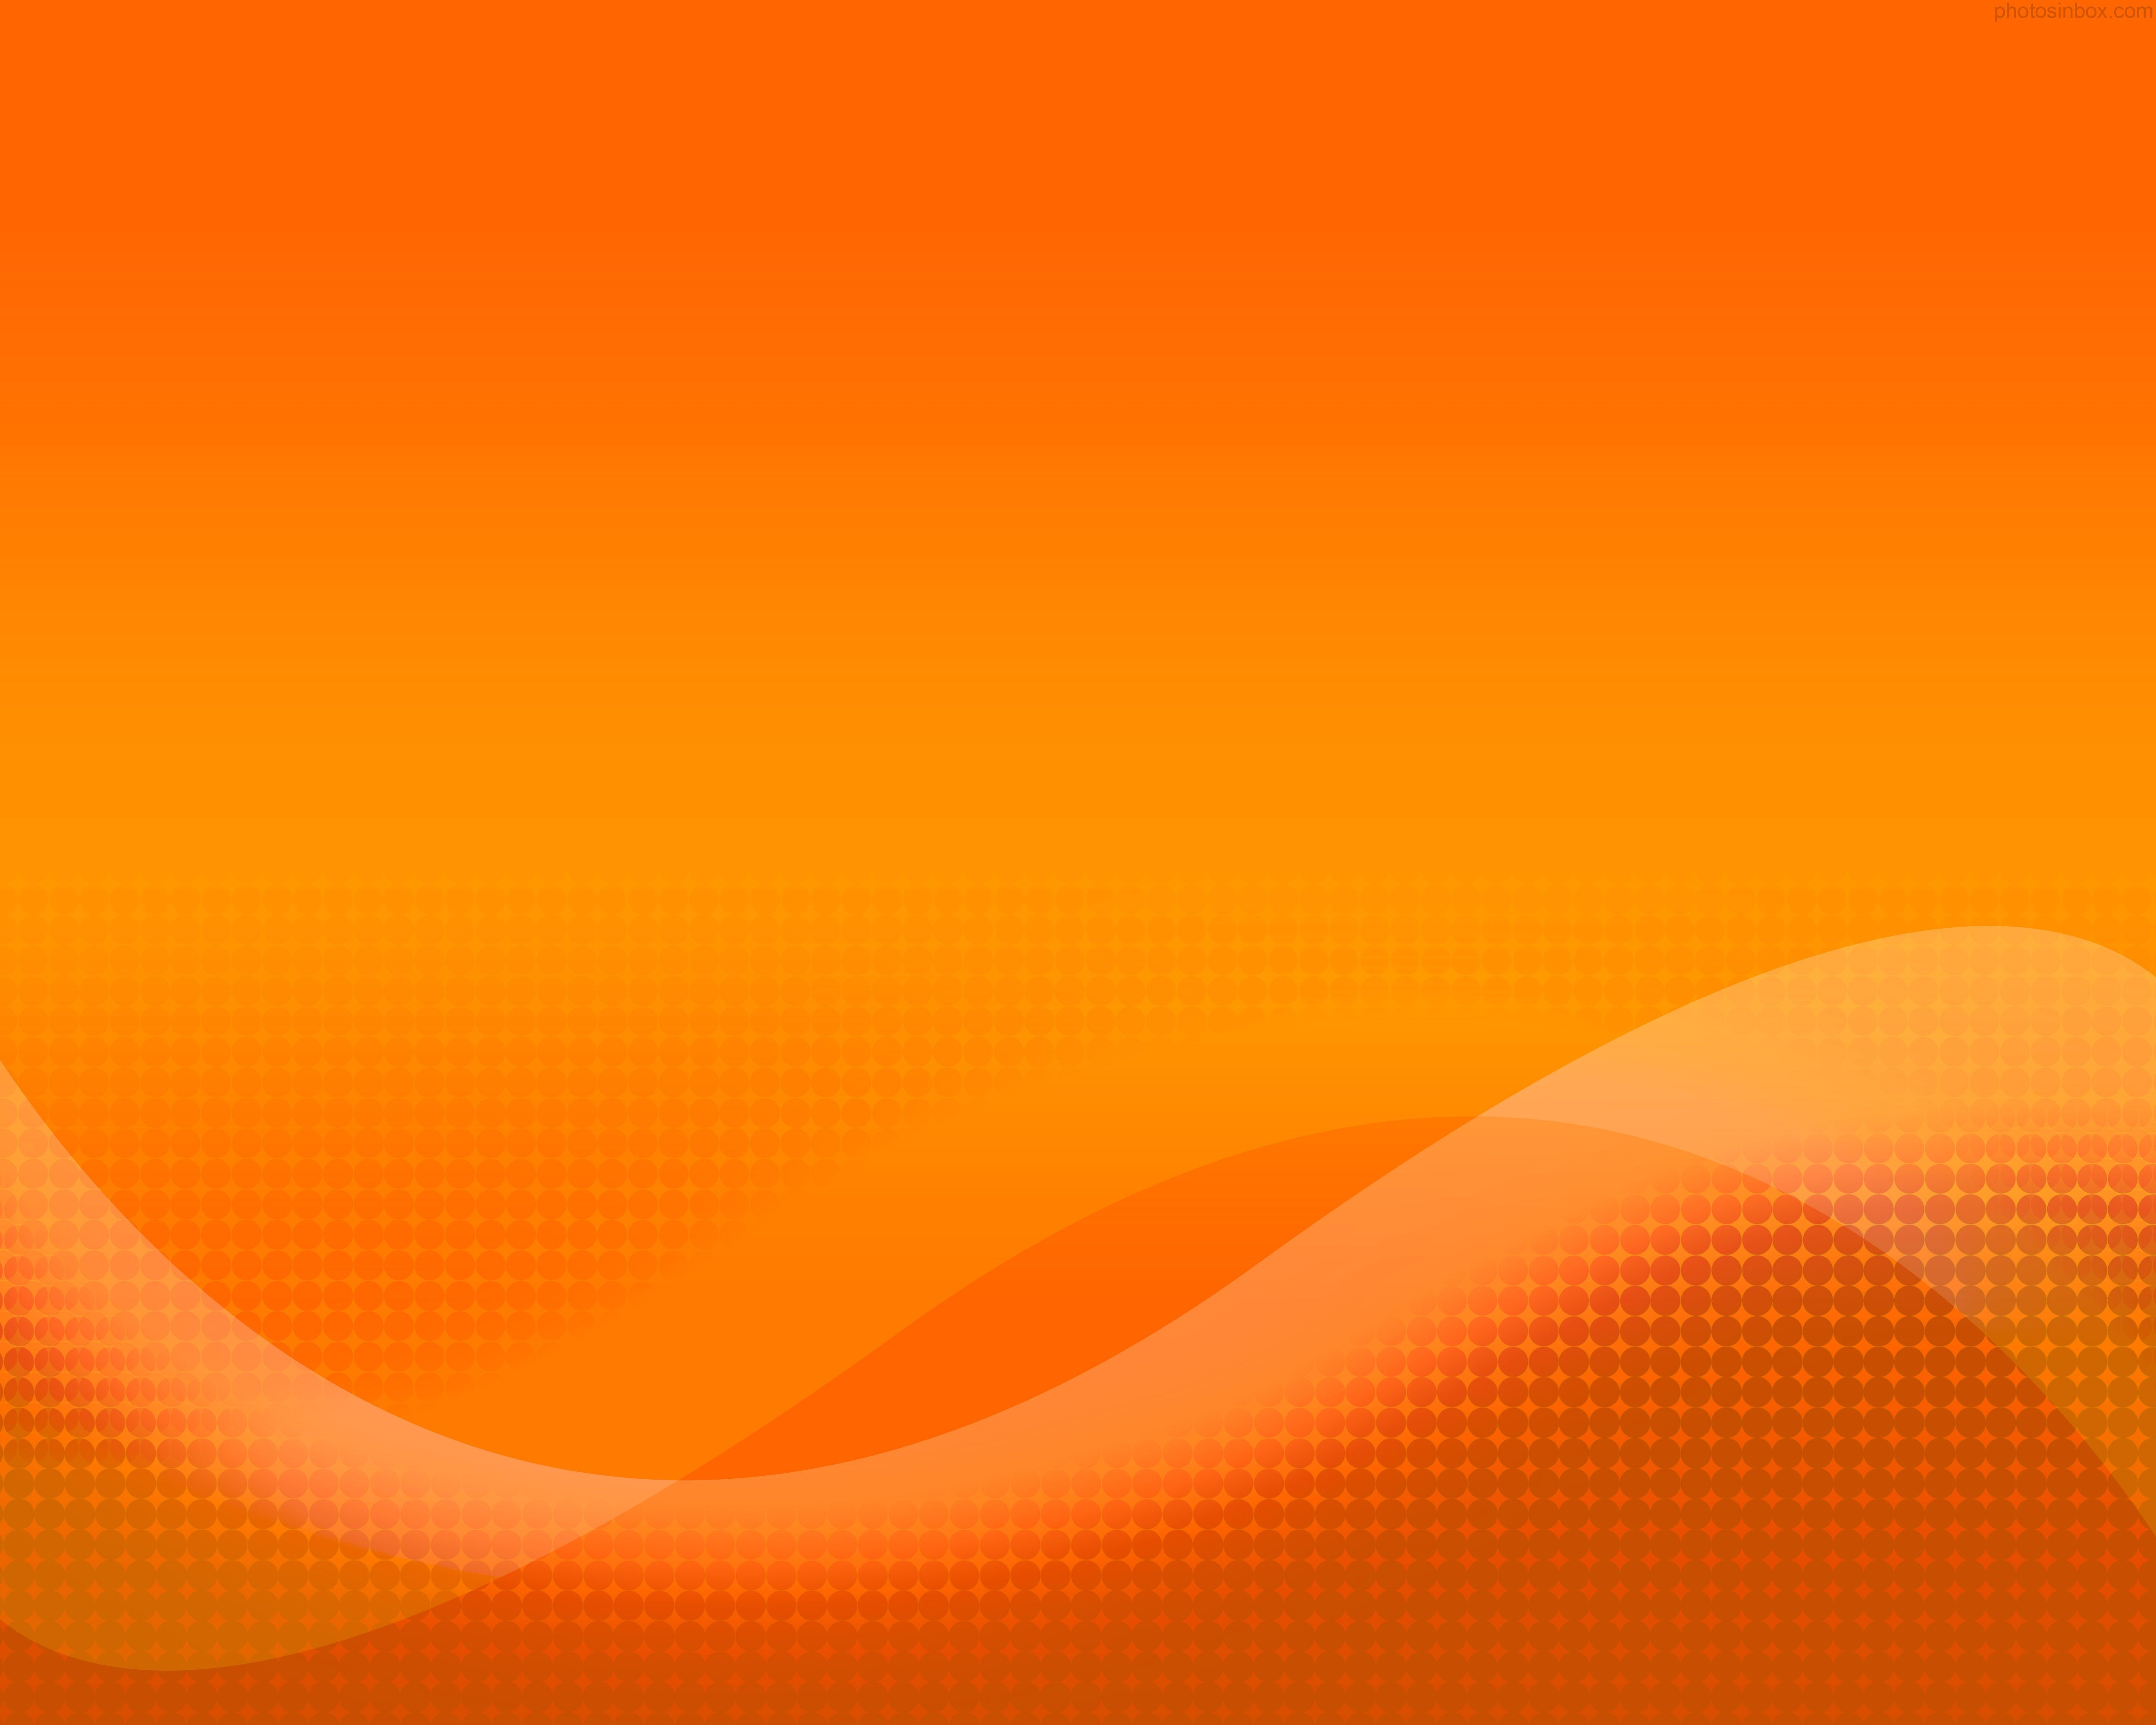 30  Beautiful Orange Wallpapers 100% Quality HD for Light Orange Background Wallpaper  45hul